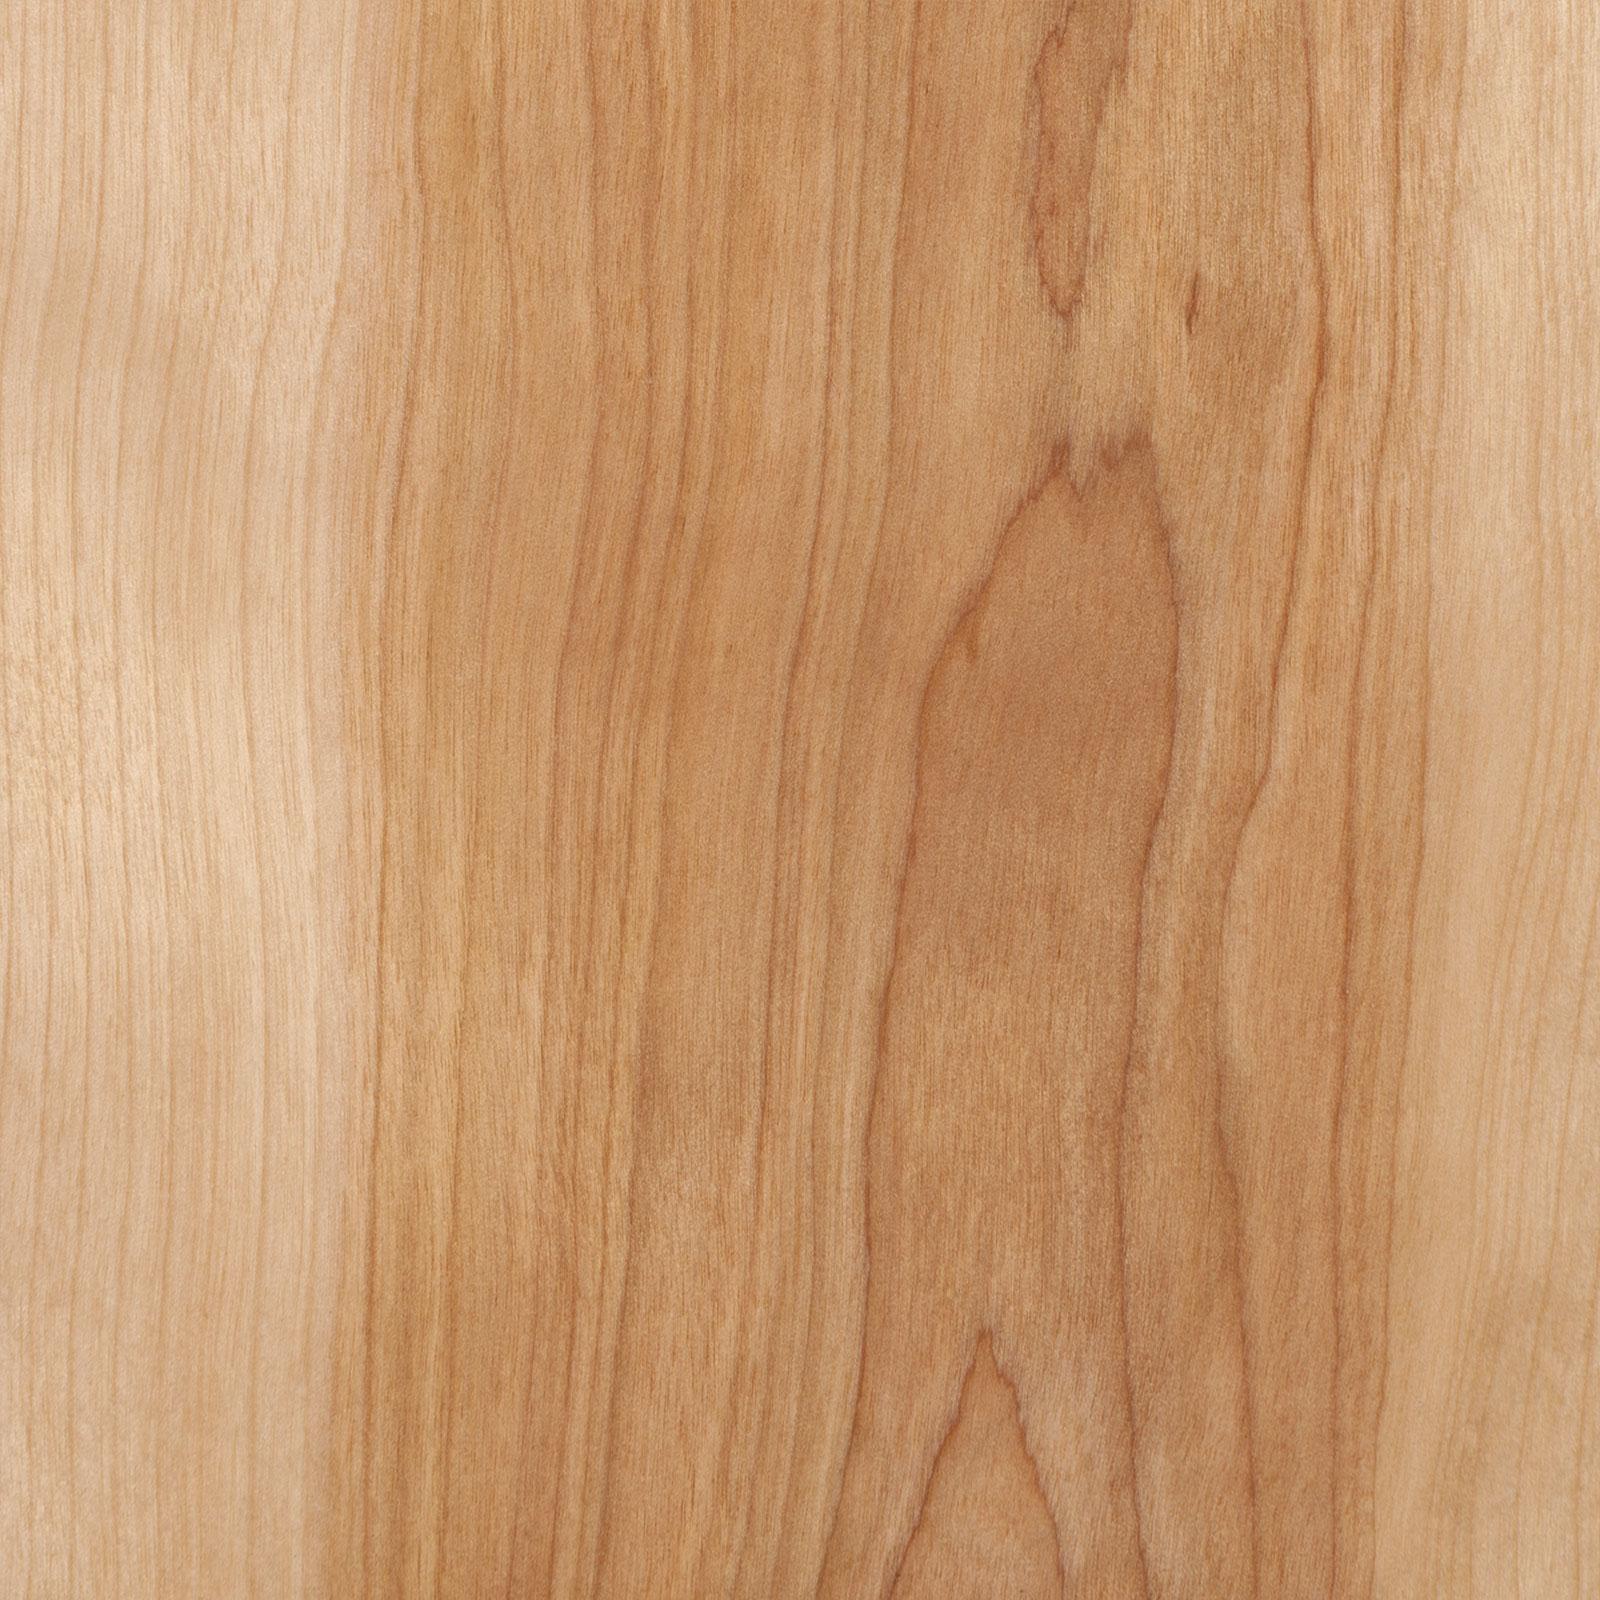 Birch trustile doors for Berch wood